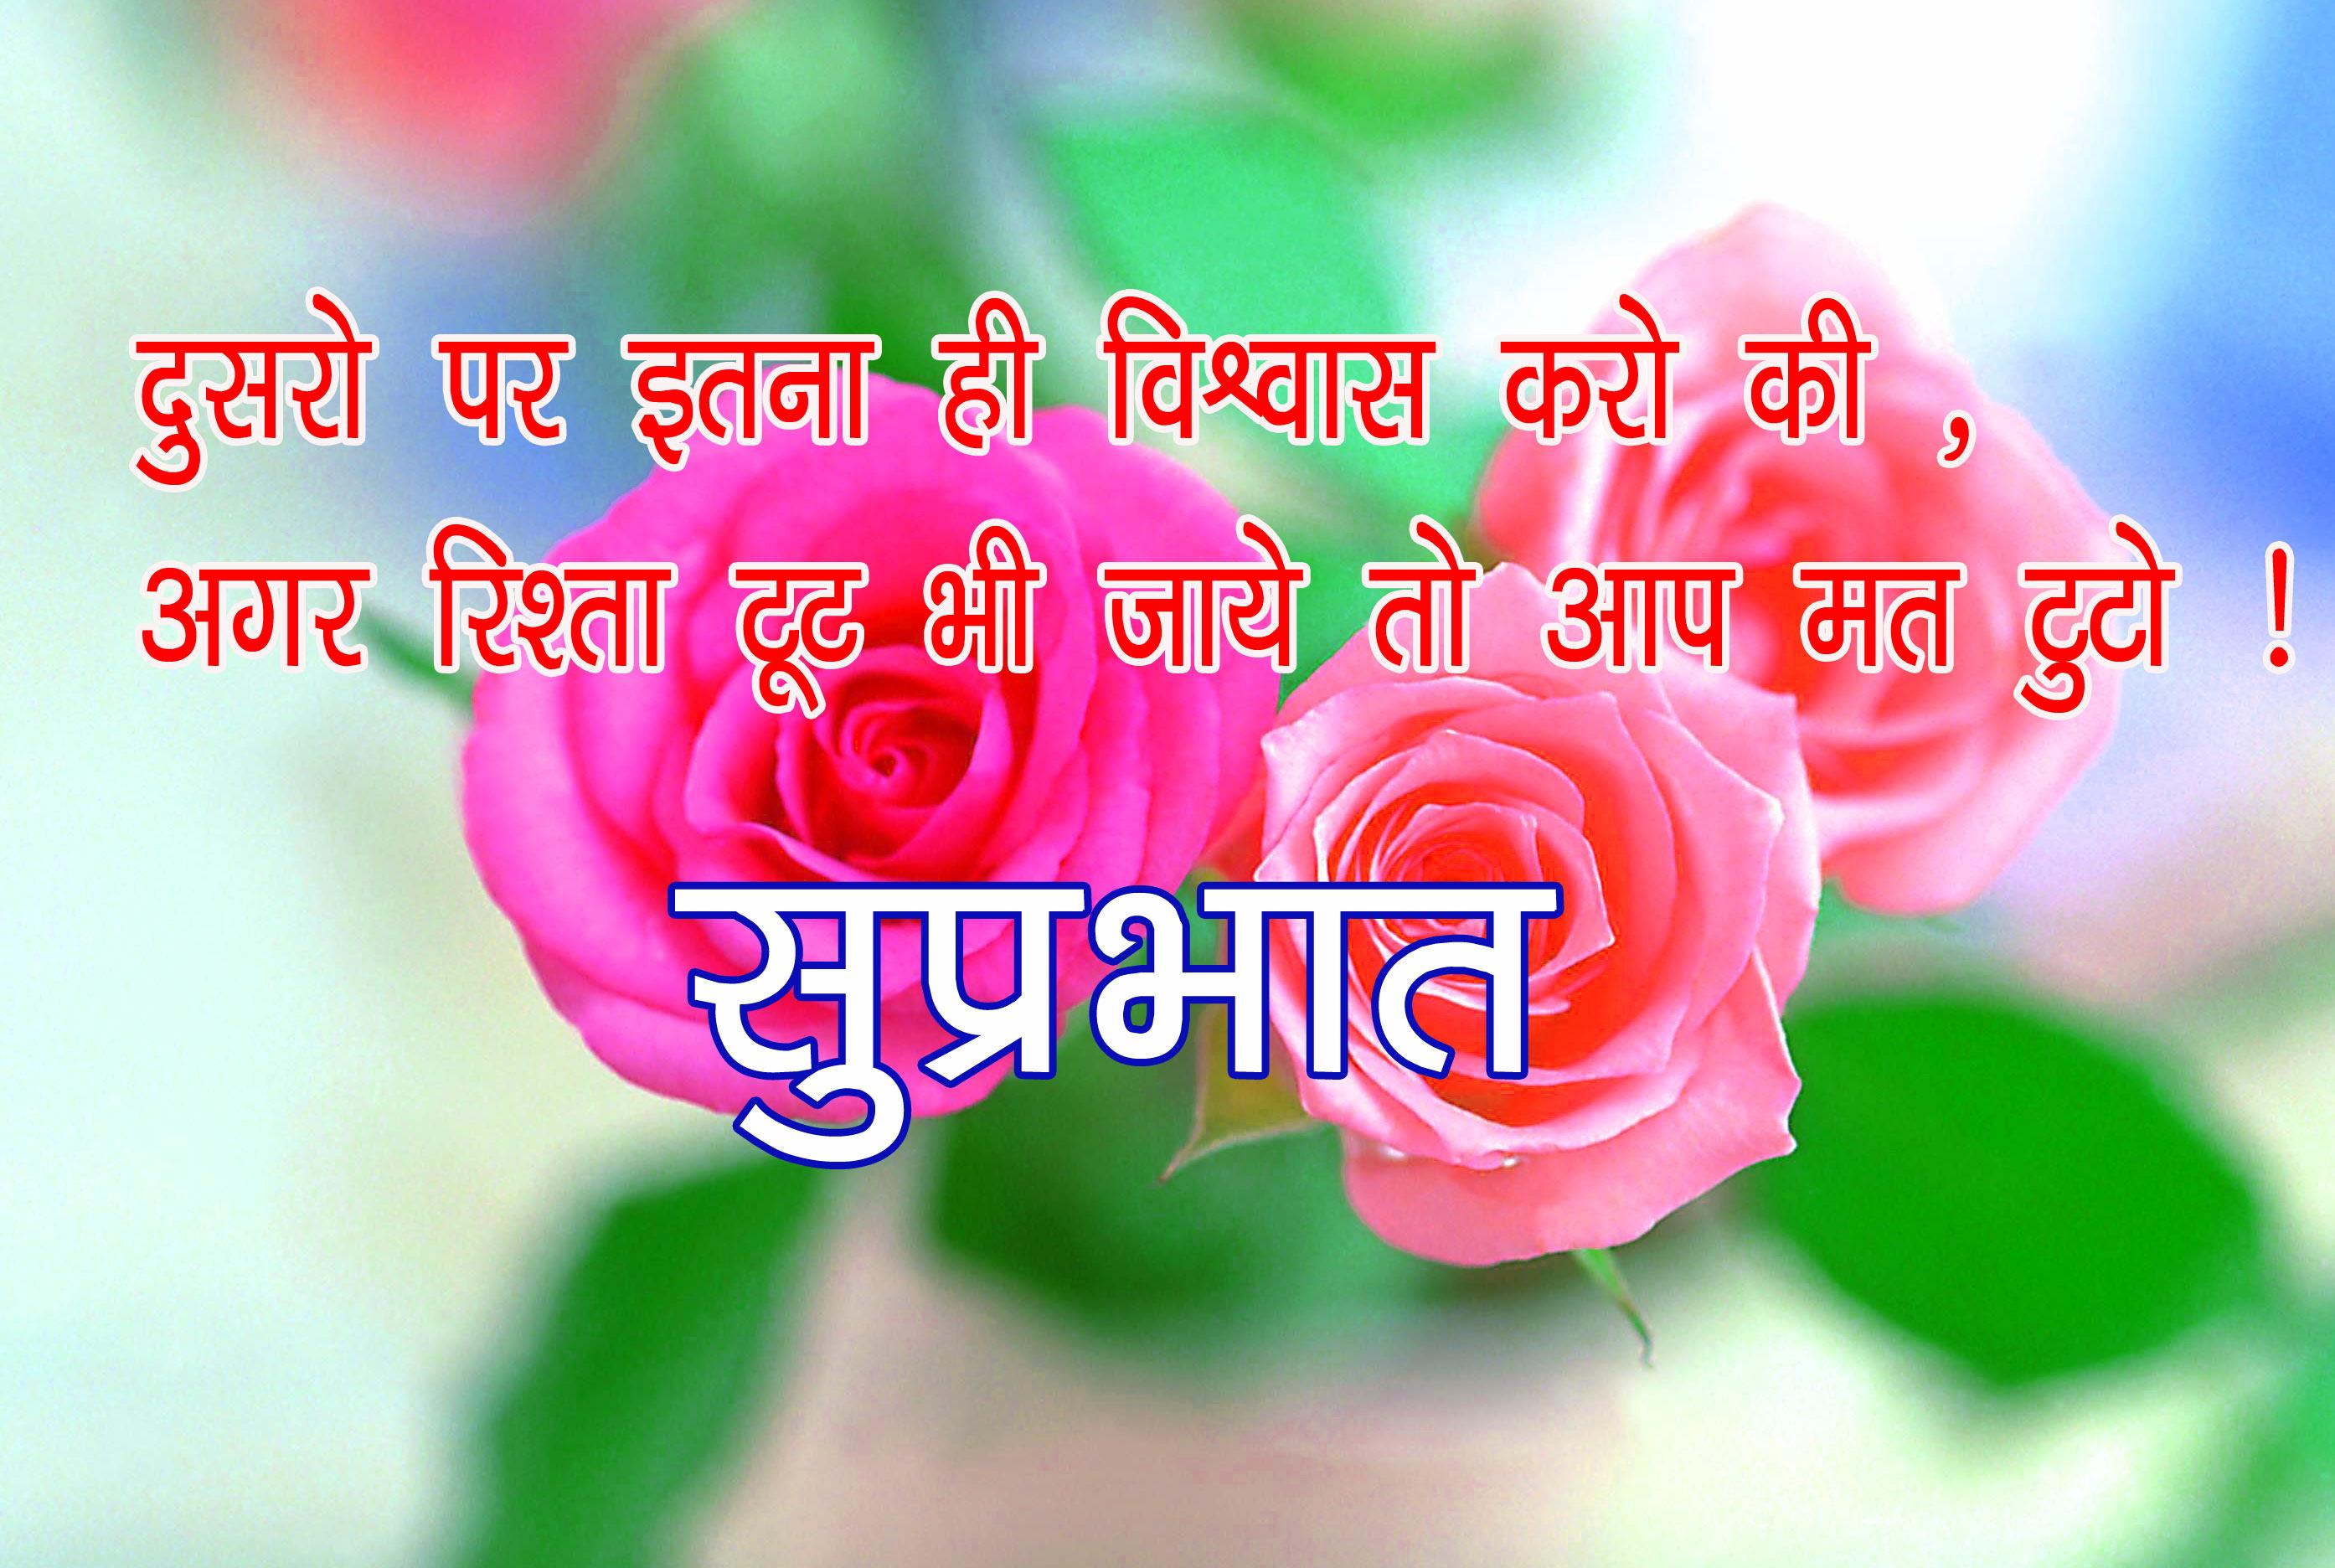 Good Morning Hindi Suvichar Images Photo Free for Whatsapp